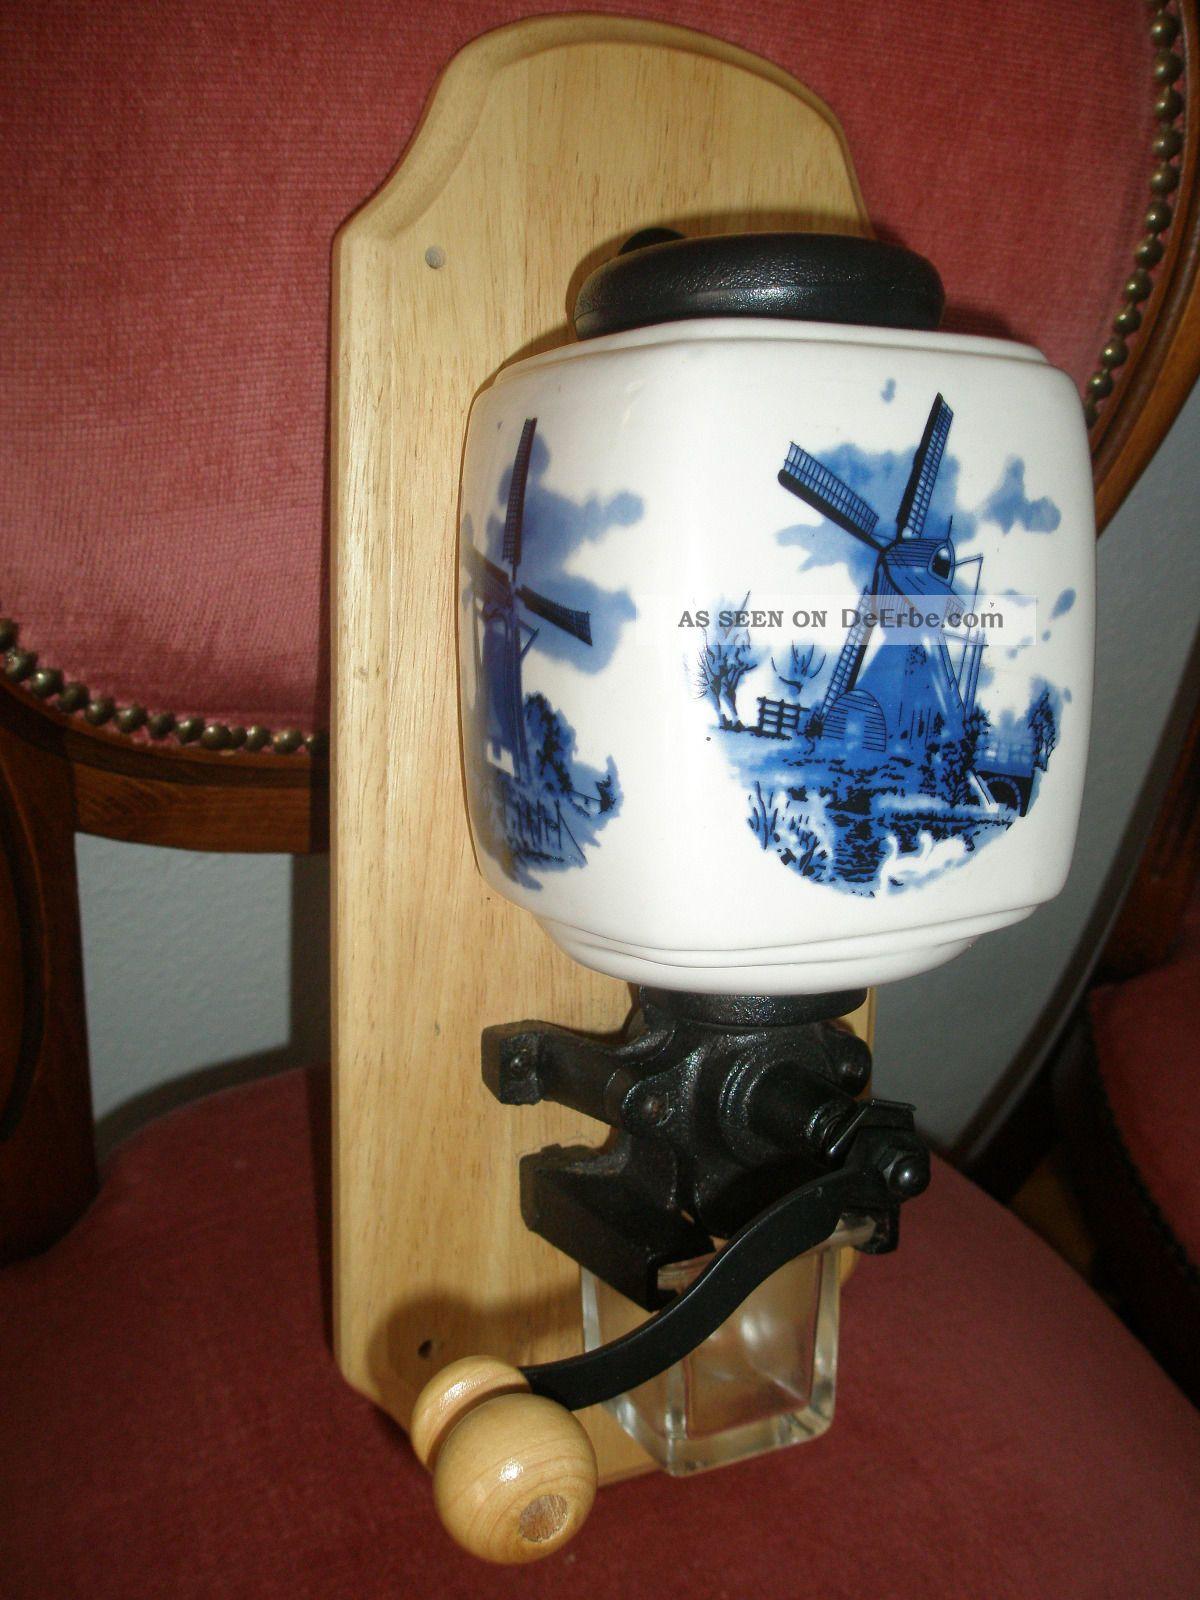 Alte Wand Kaffeemühle Keramik Holz Keramik Groß Haushalt Bild